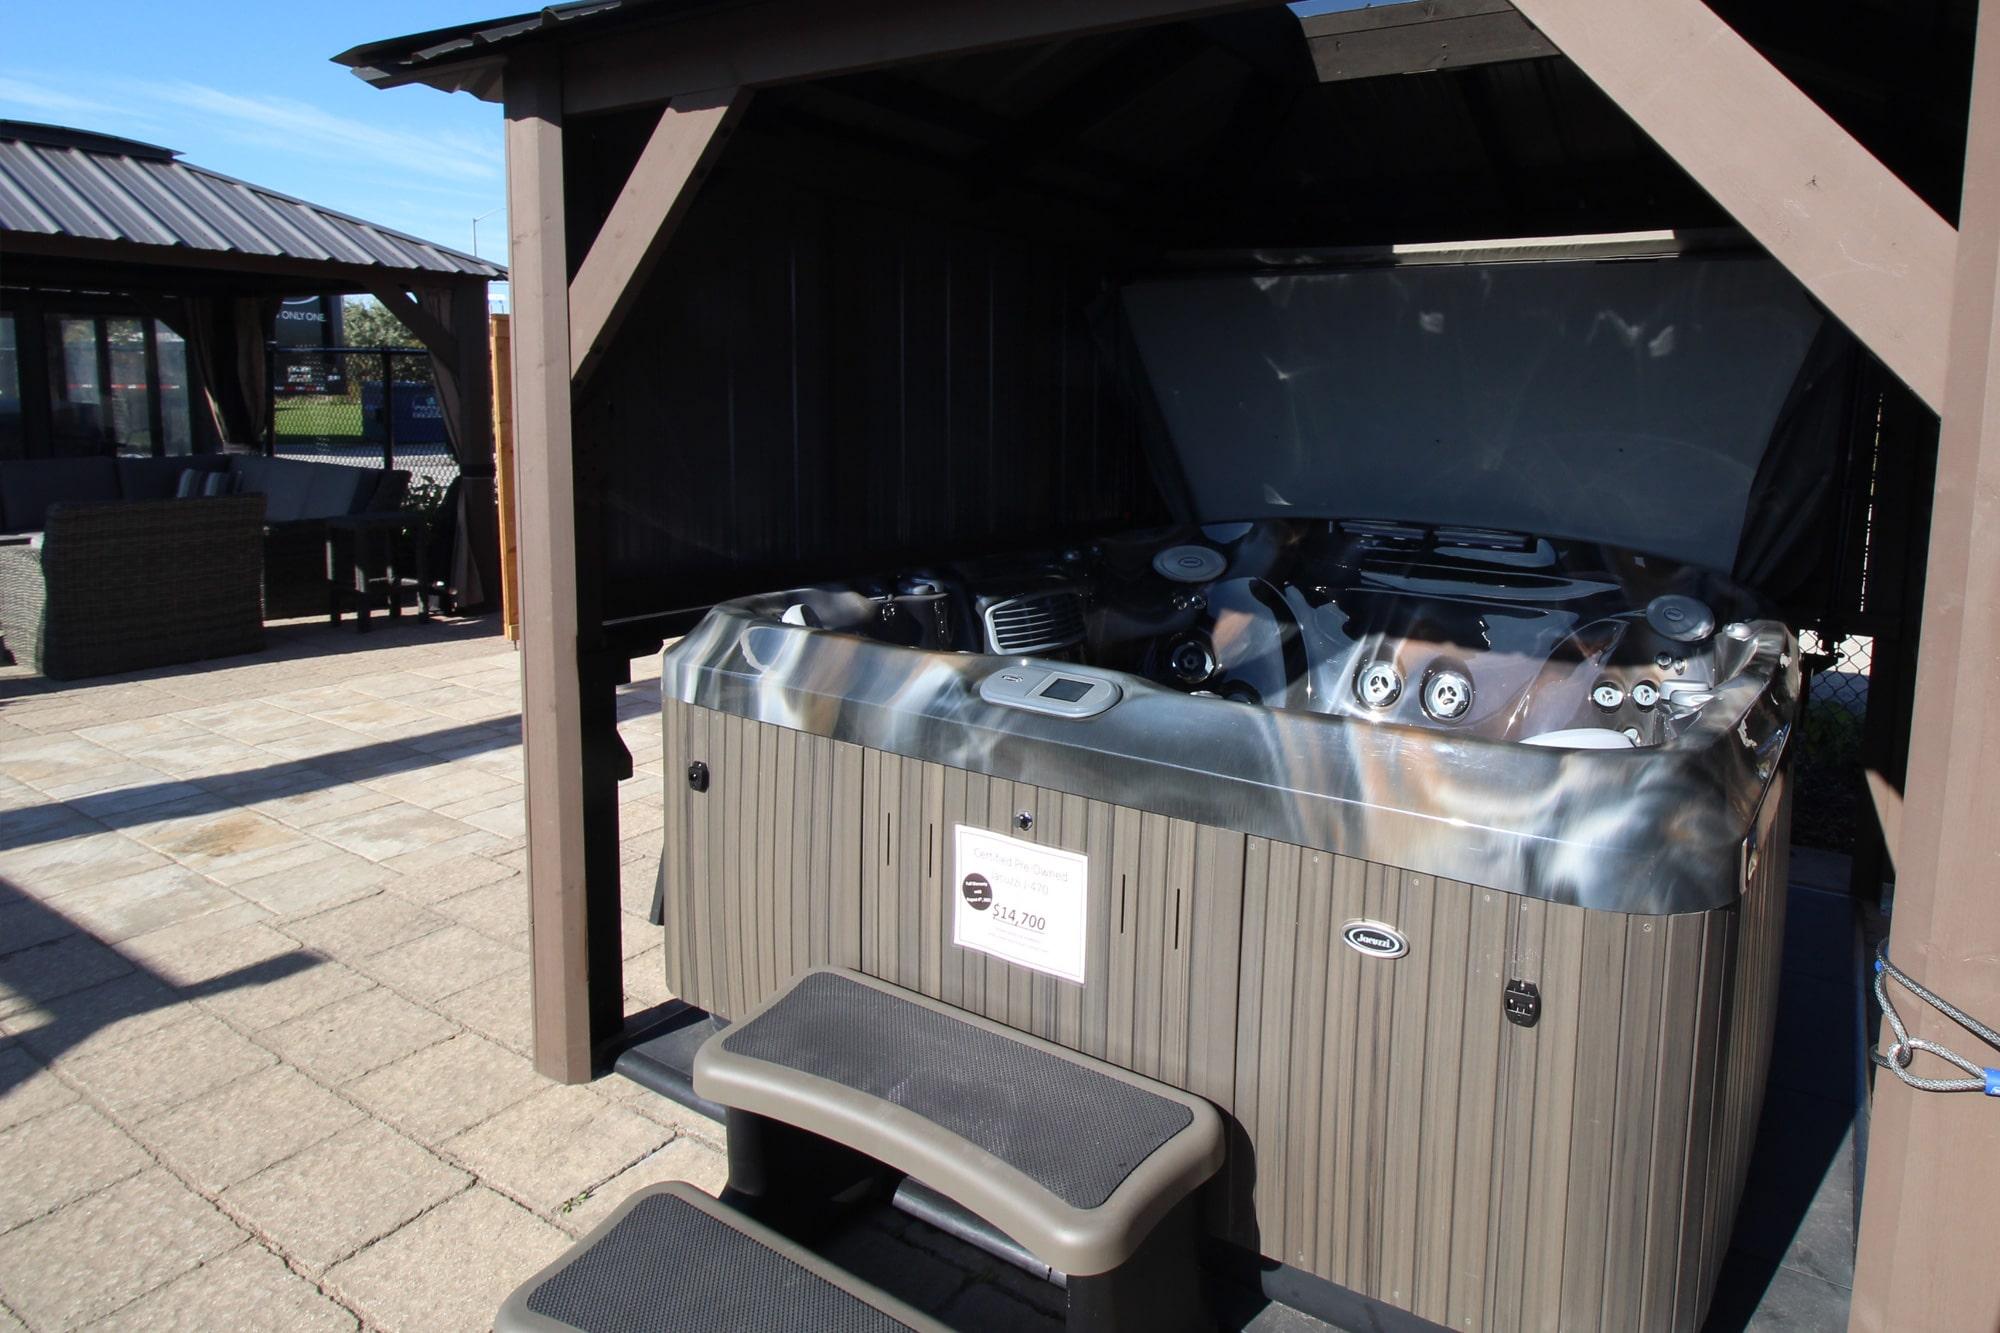 Jacuzzi Burlington Outdoor Showroom Hot tub in Gazebo